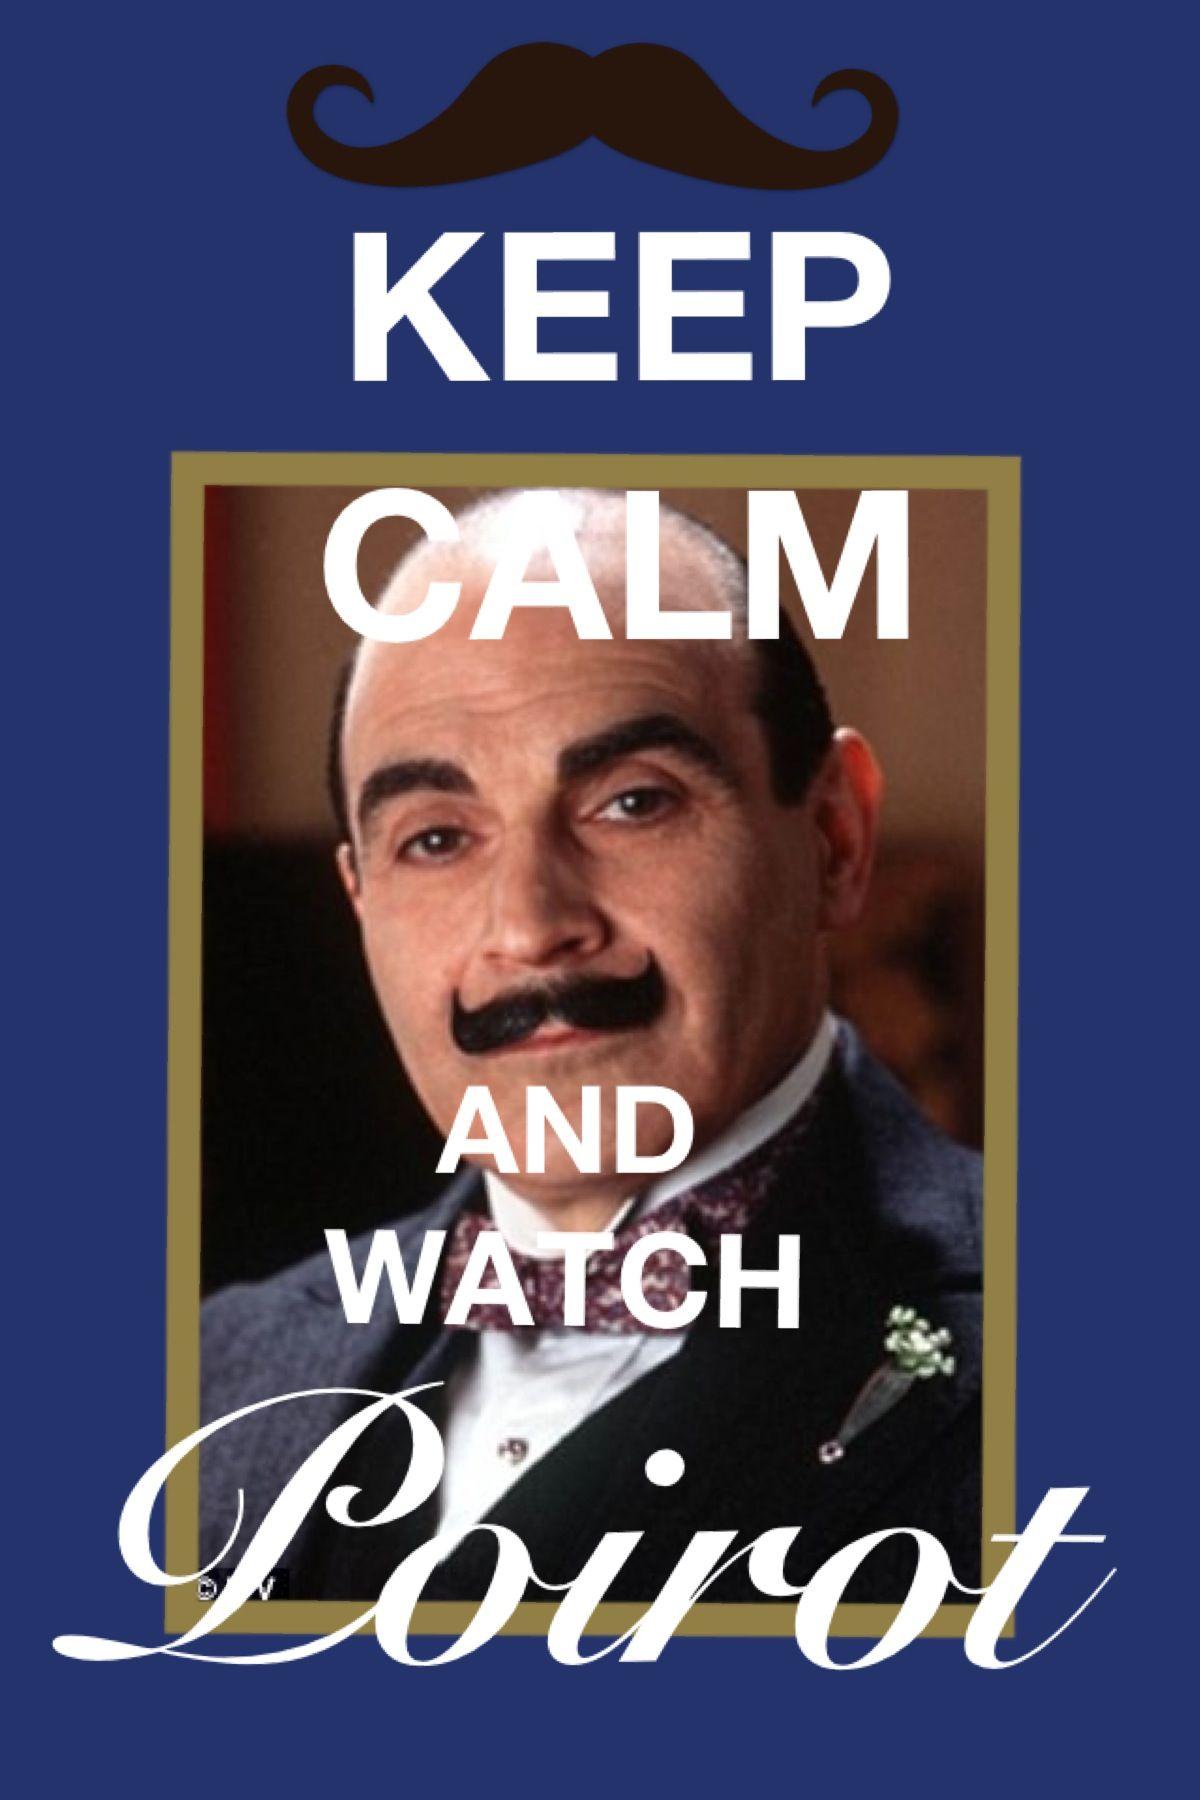 Watch Poirot Hercule Poirot Agatha Christie Poirot